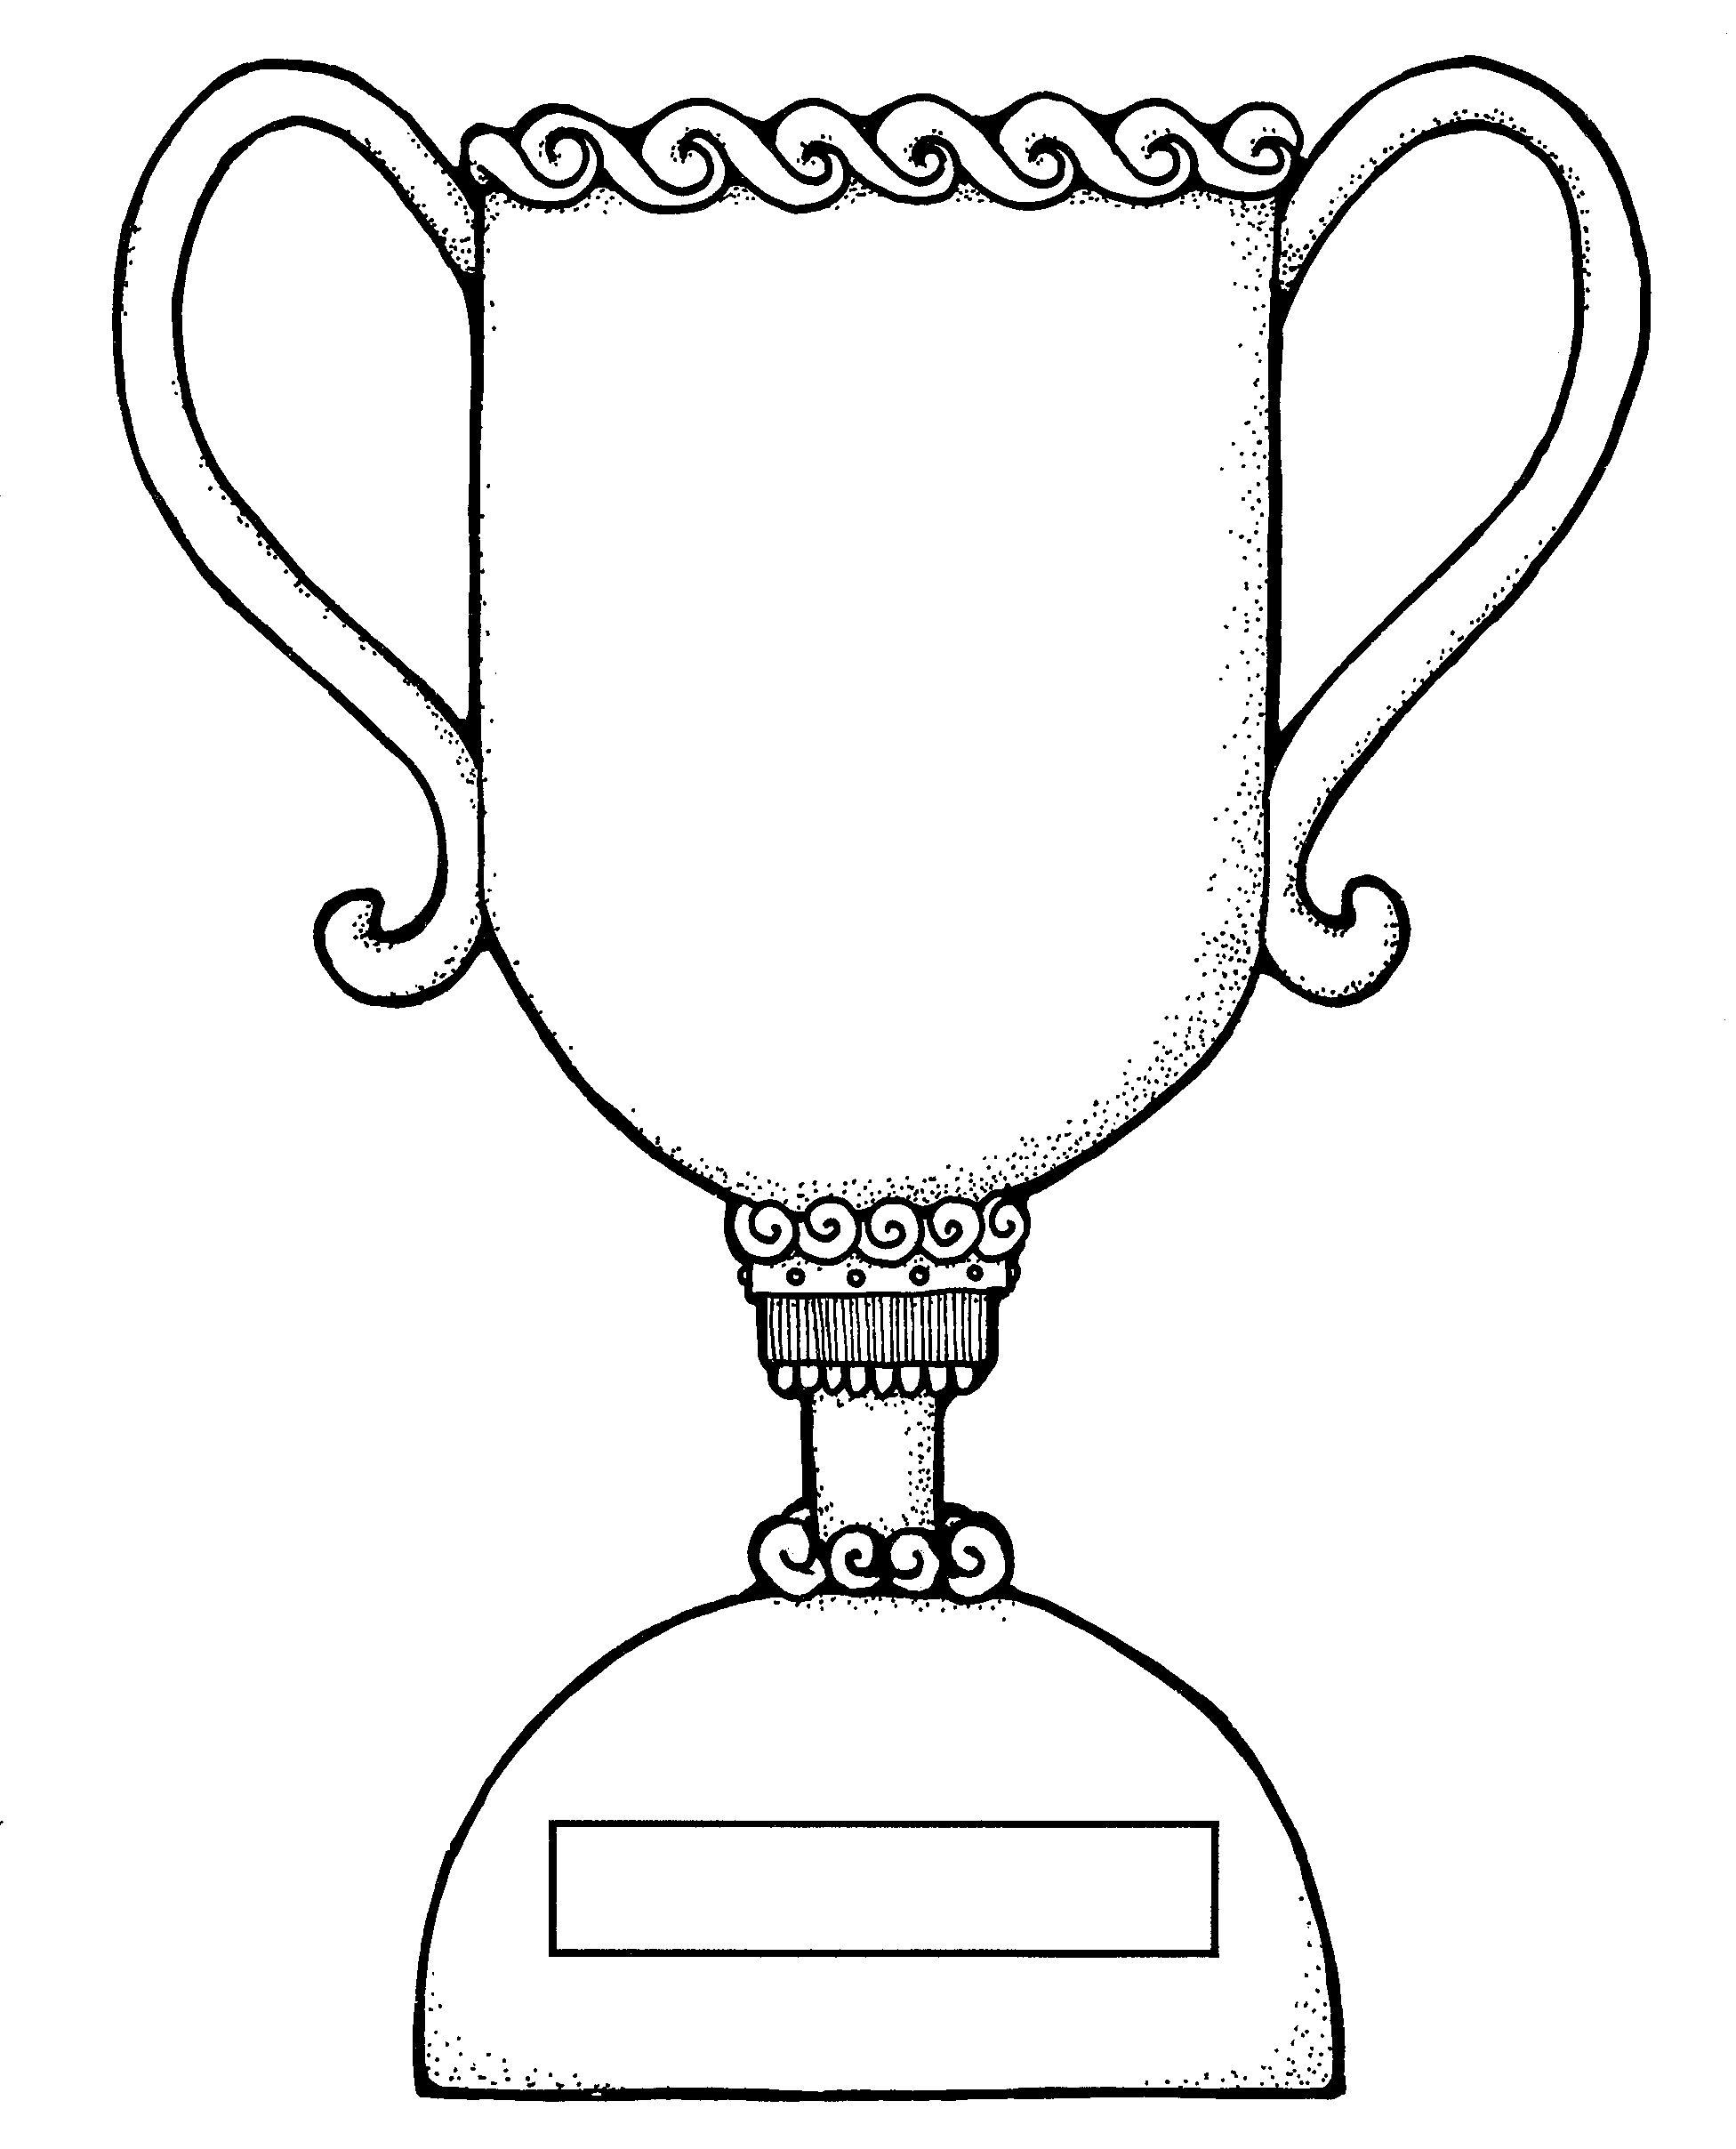 trophy coloring sheet coloring pages diy trophy diy trophy color coloring pages. Black Bedroom Furniture Sets. Home Design Ideas